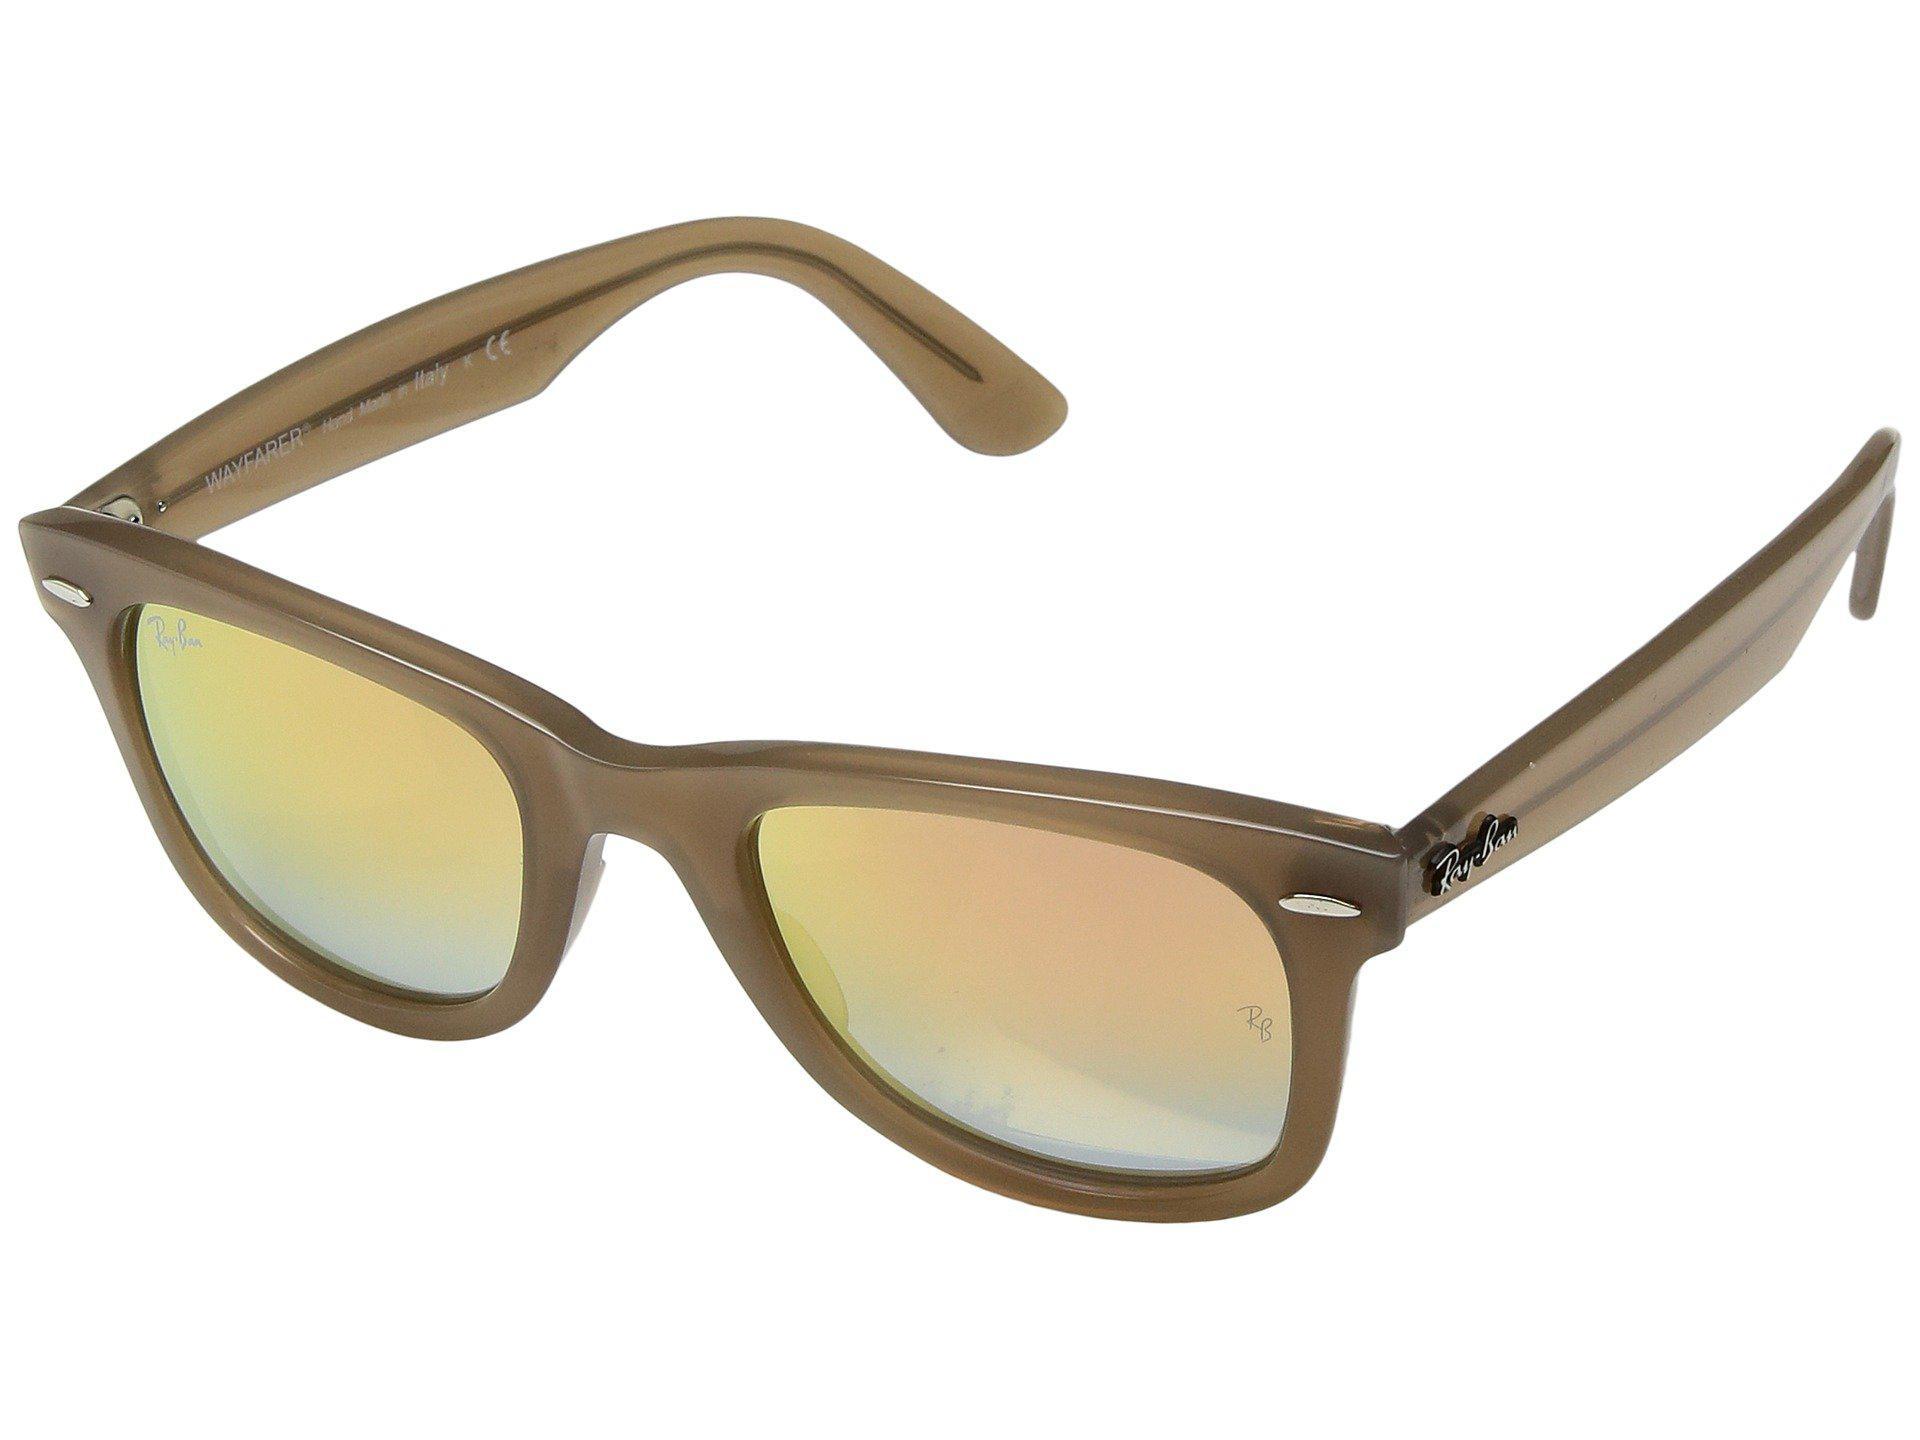 379c973f4ed Ray-Ban. Men s Brown Wayfarer Ease Rb4340 50mm (black polarized Green  Classic G-15) Fashion Sunglasses